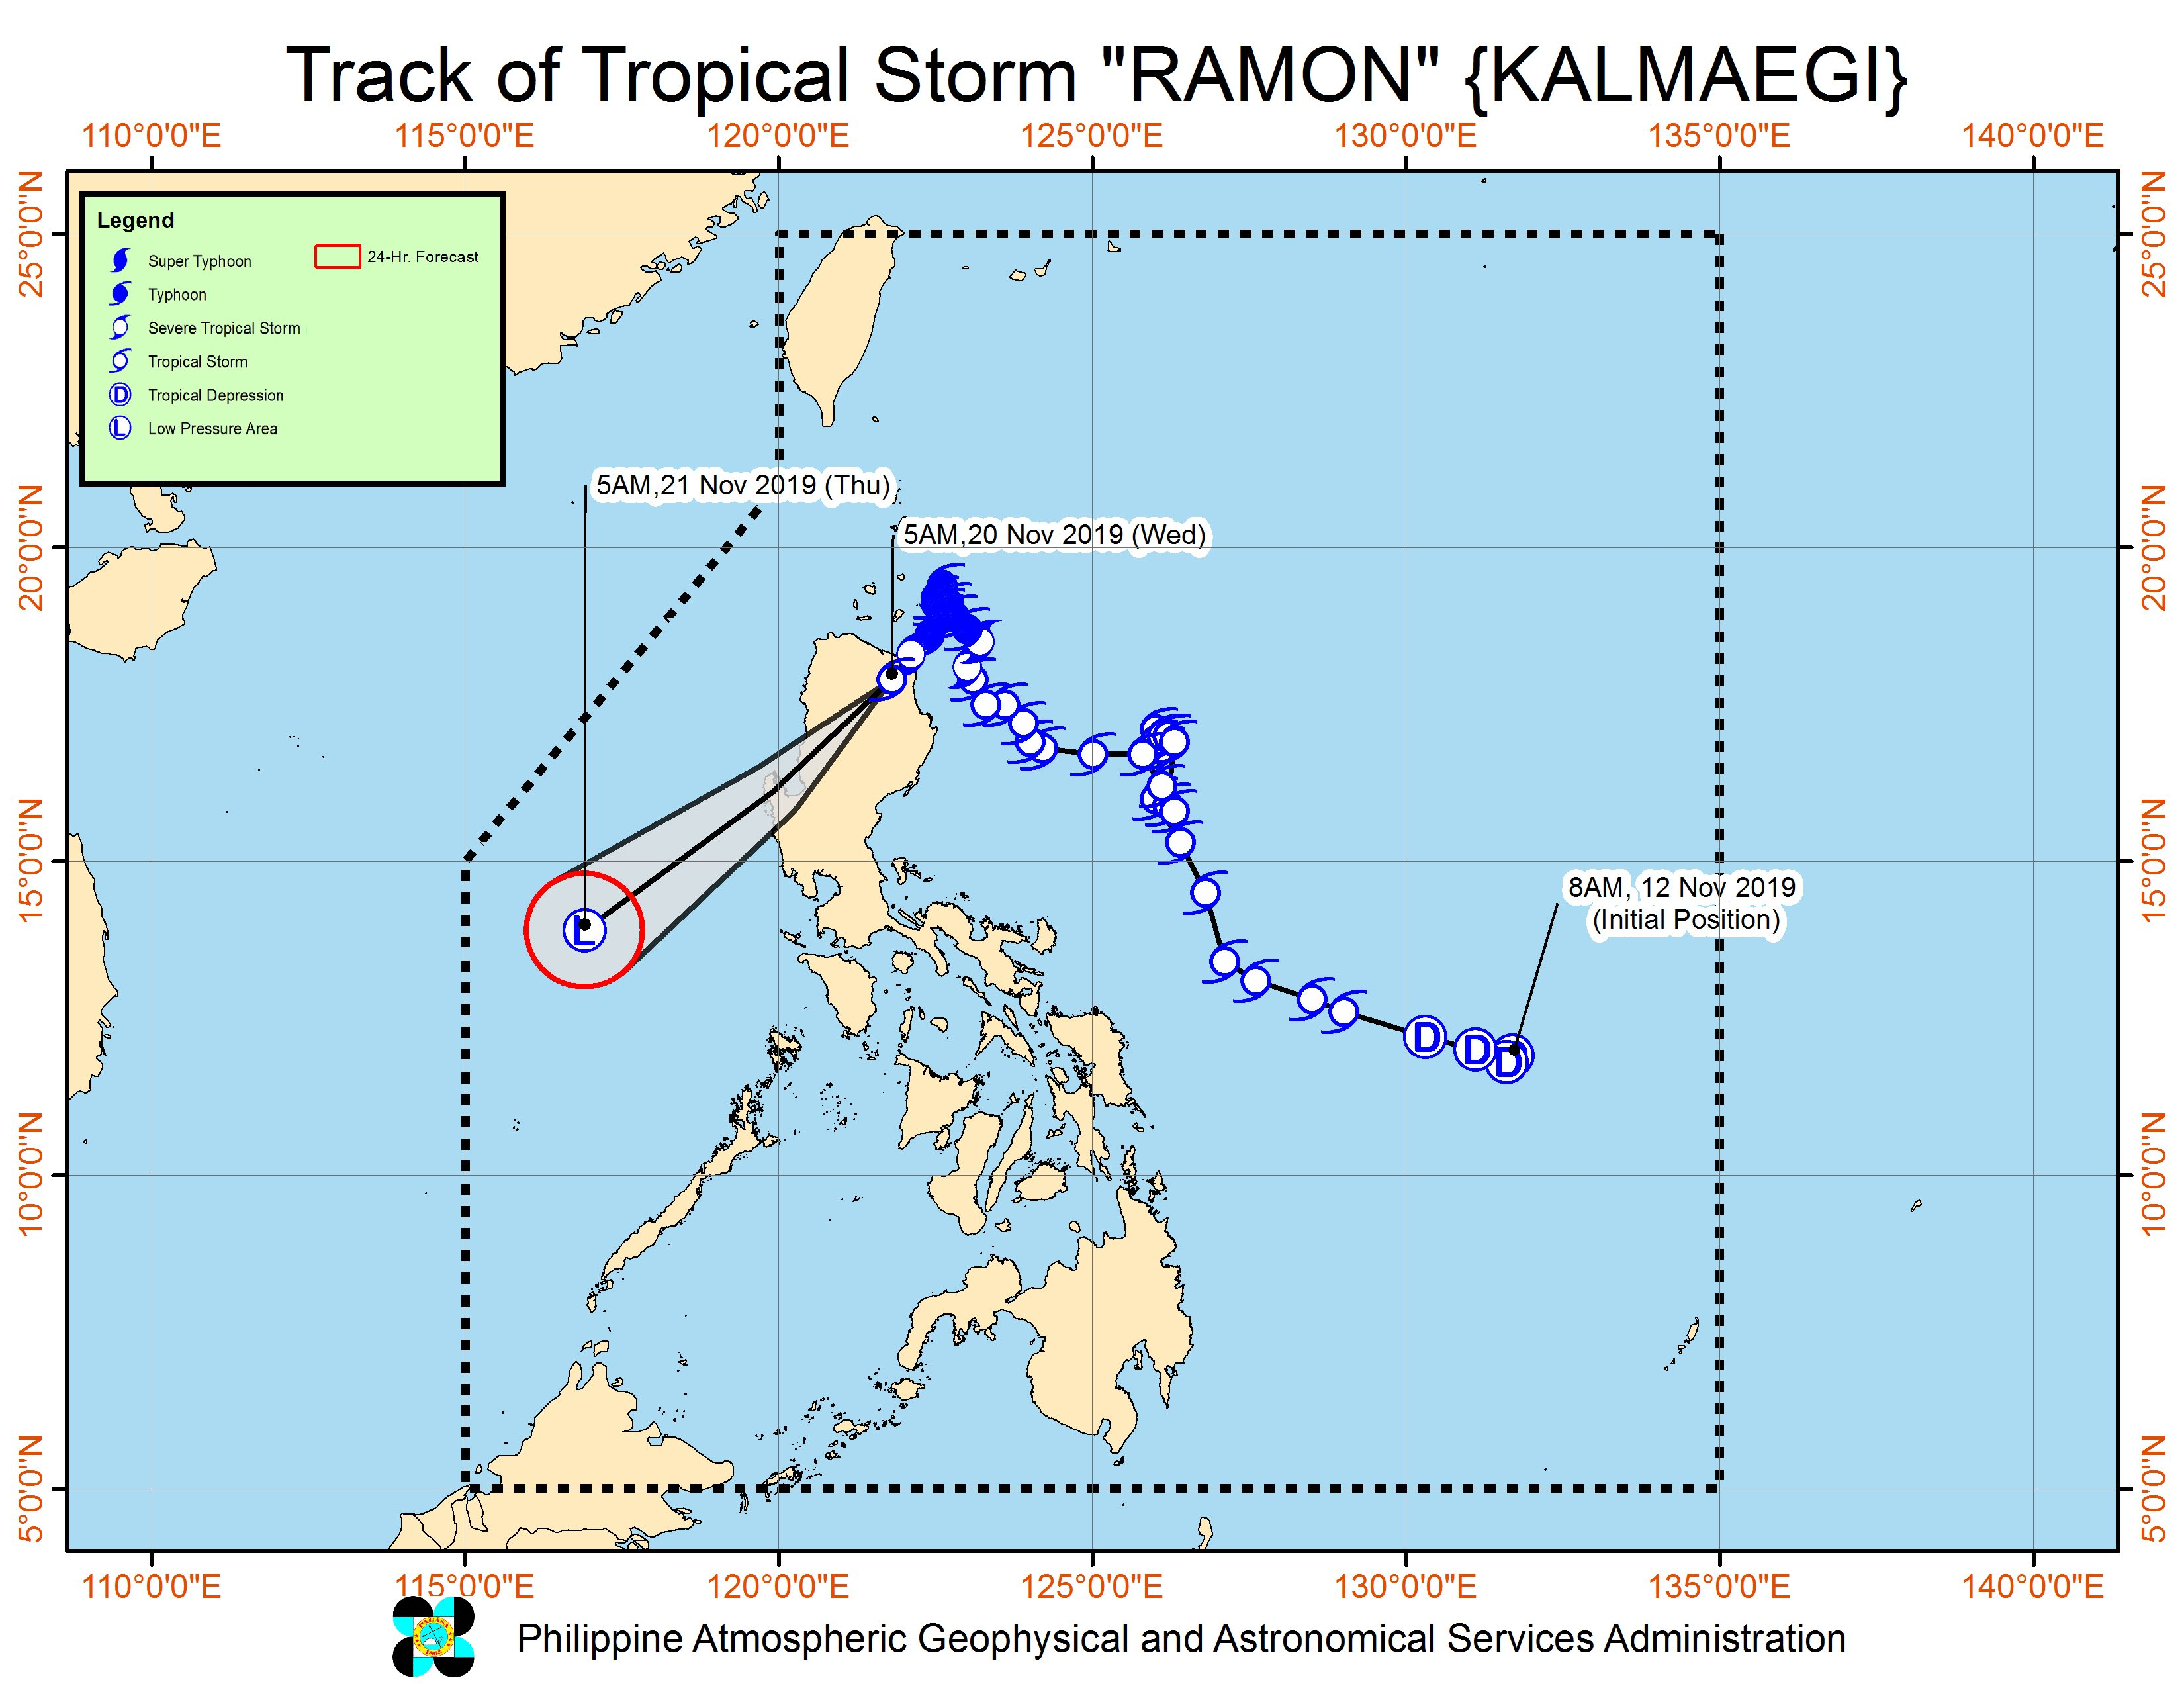 Forecast track of Tropical Storm Ramon (Kalmaegi) as of November 20, 2019, 8 am. Image from PAGASA